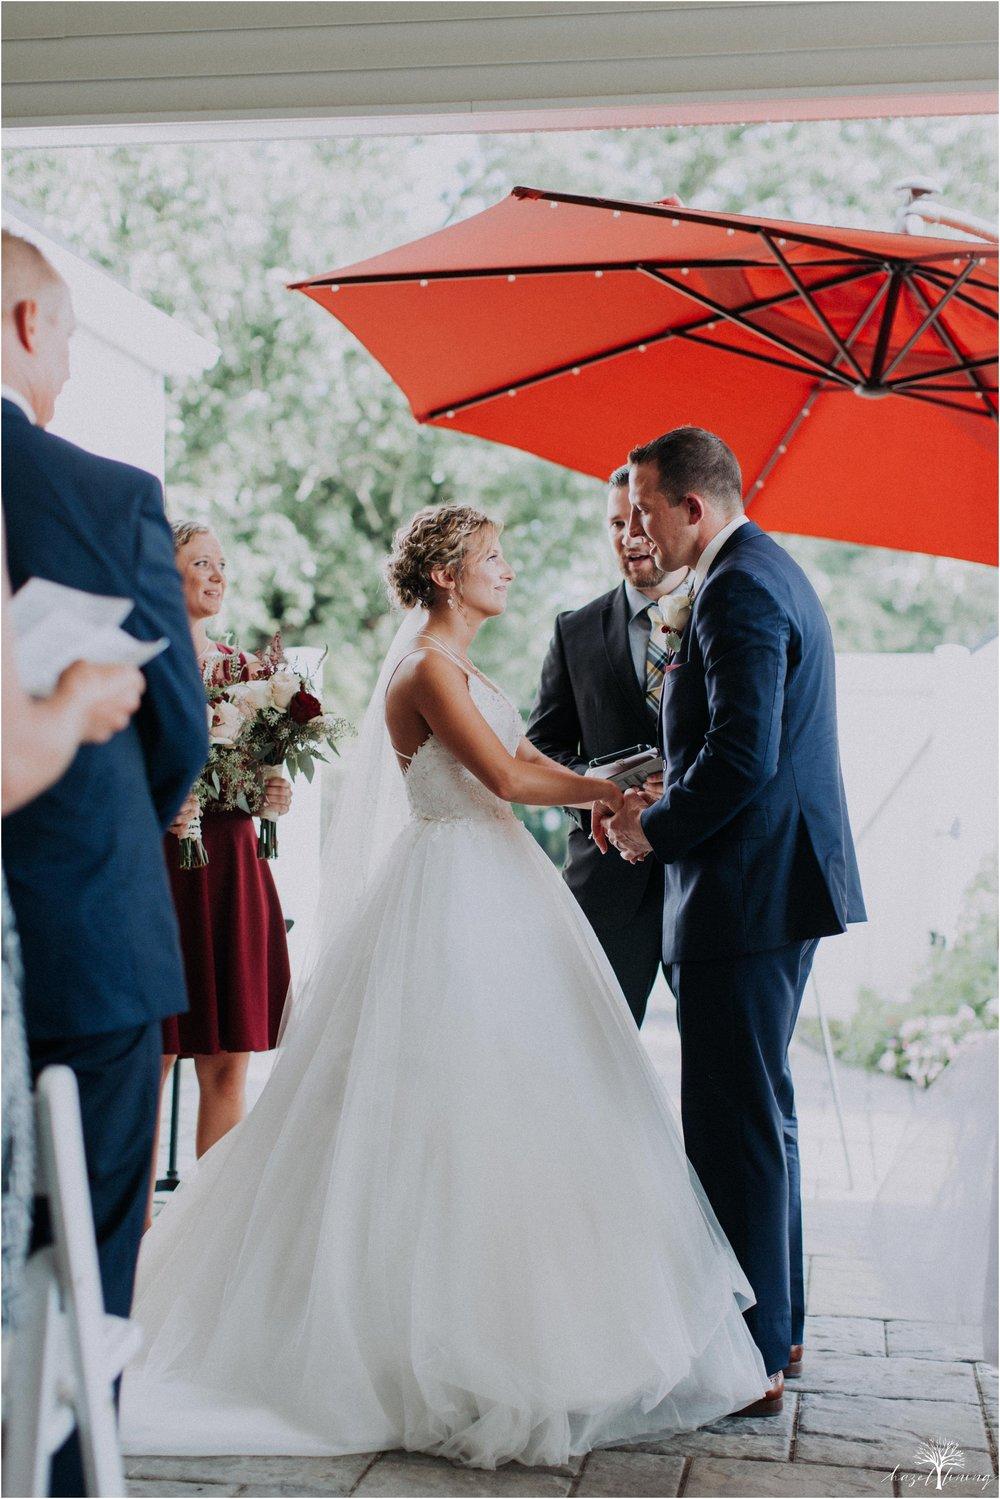 jonathan-weibel-becky-haywood-loft-at-sweetwater-cc-pennsburg-pennsylvania-rainy-day-summer-wedding-hazel-lining-travel-wedding-elopement-photography_0055.jpg